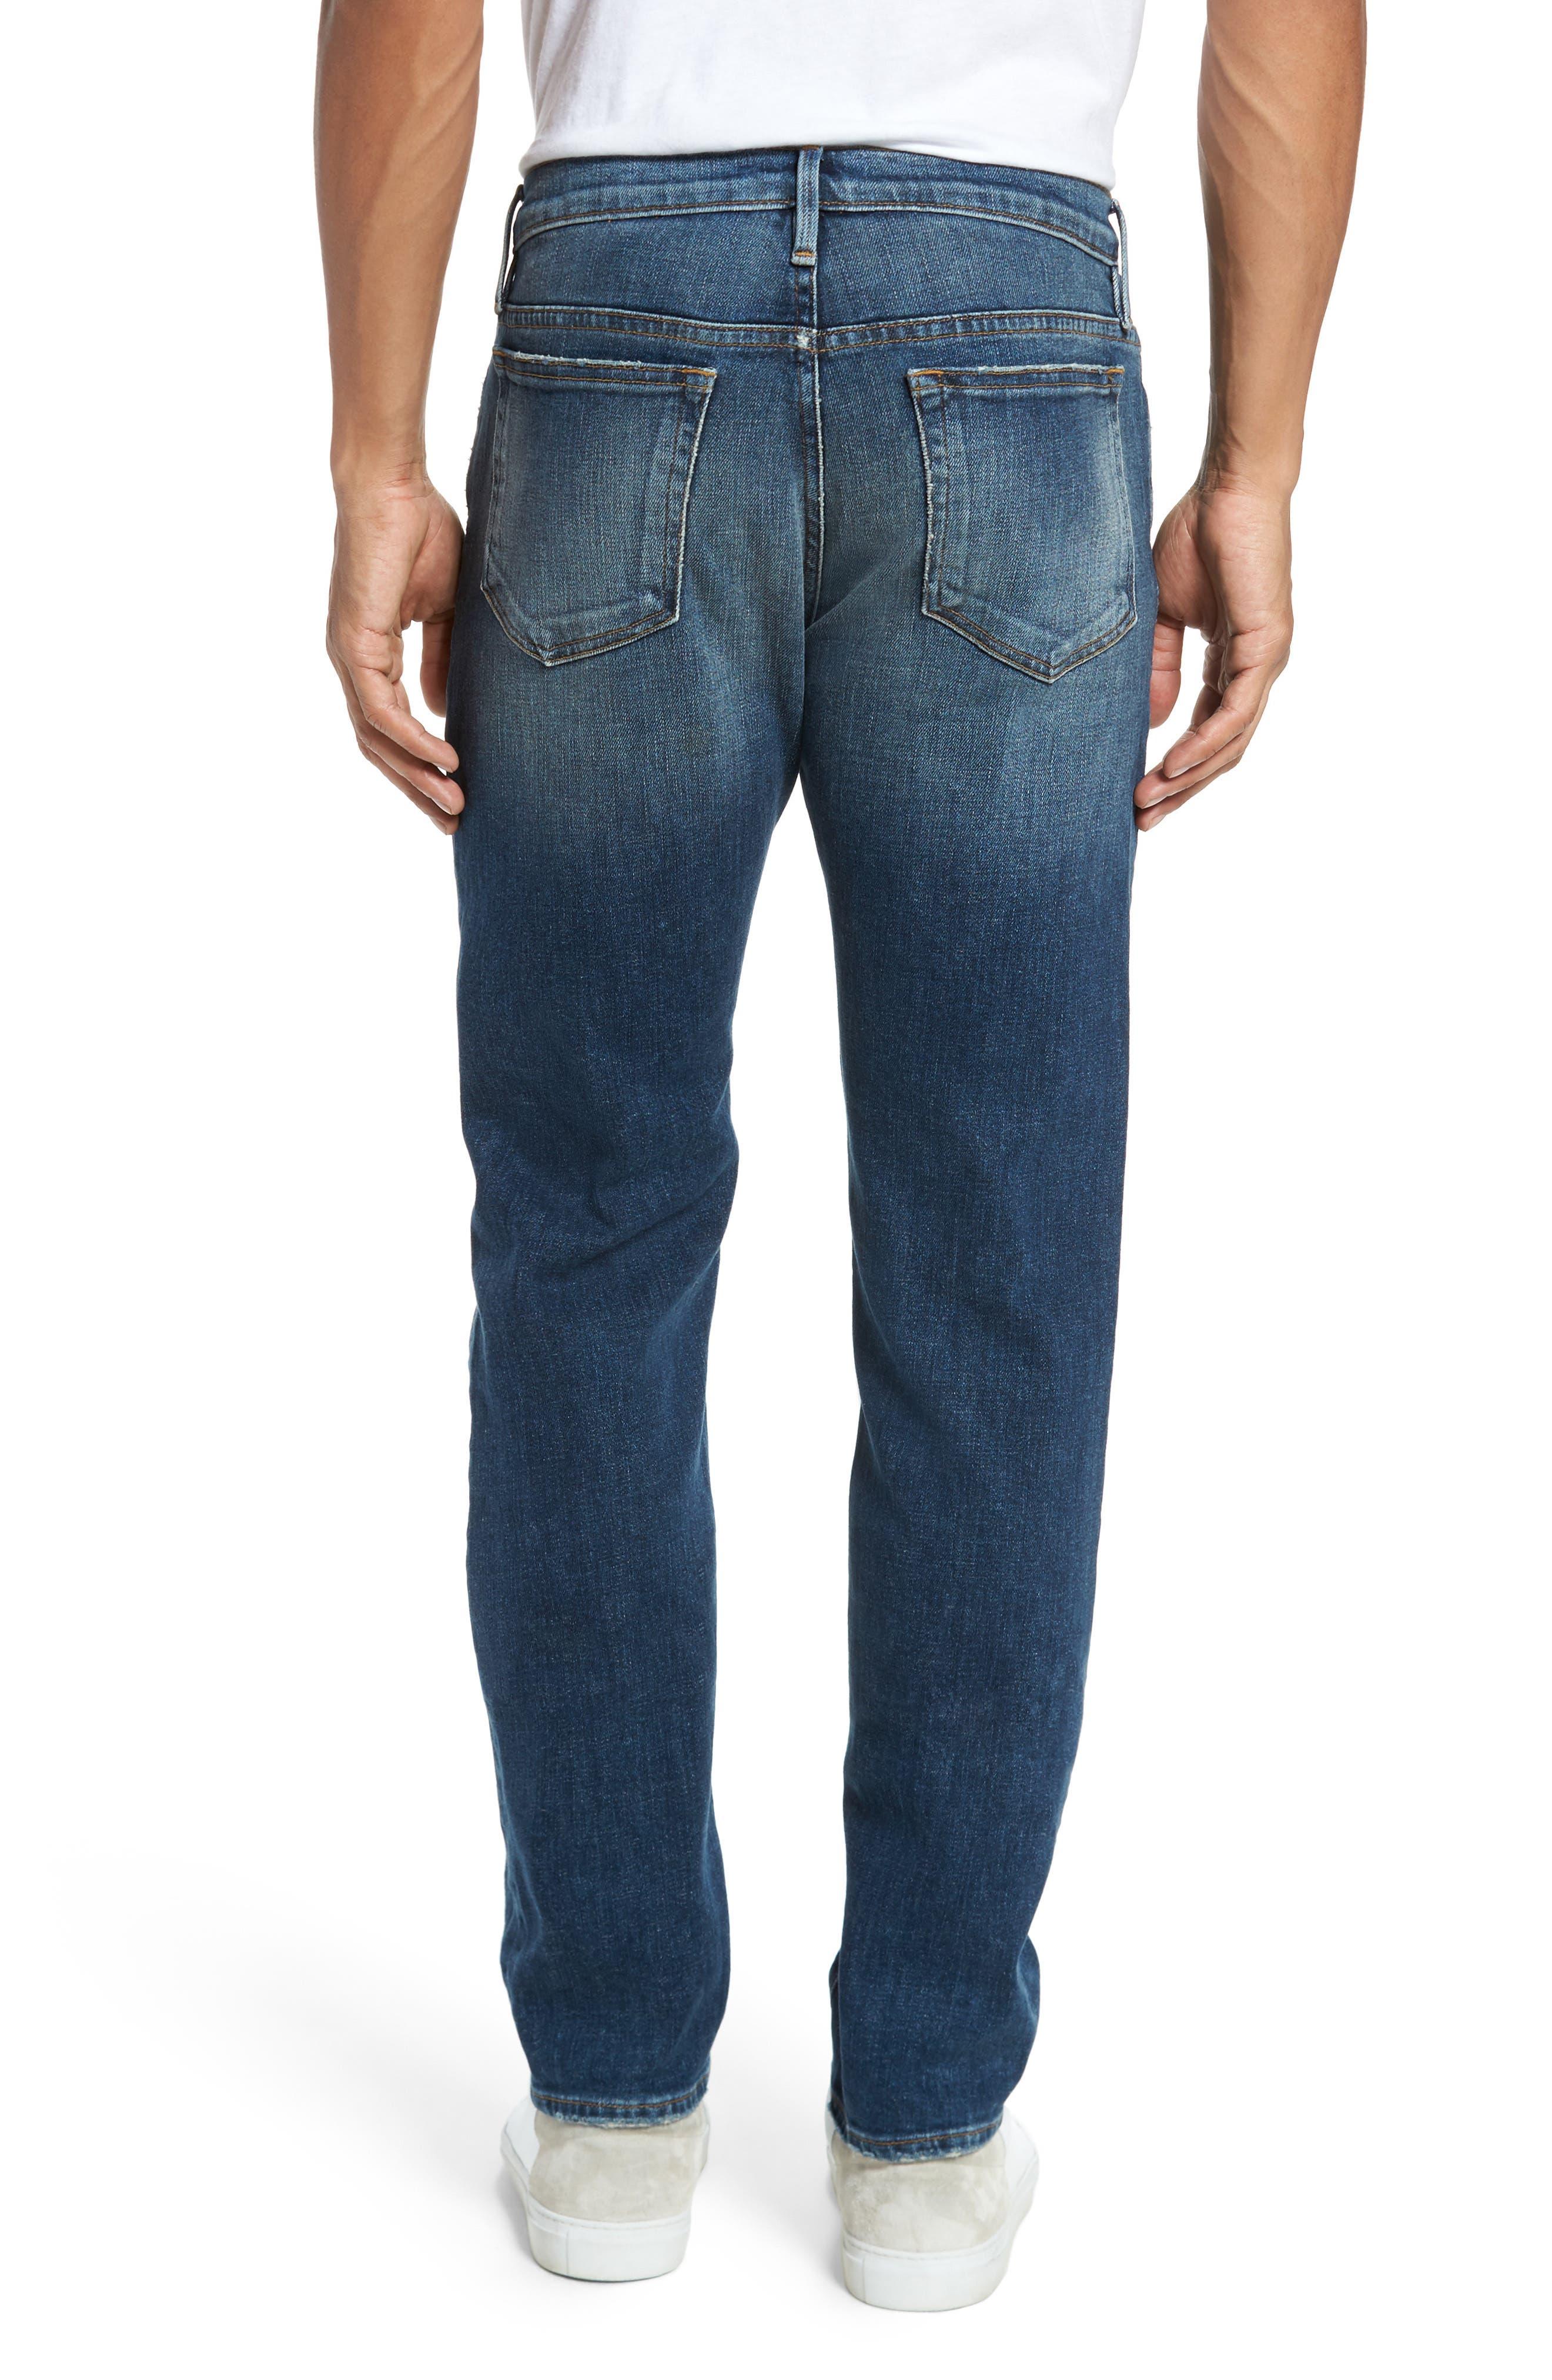 L'Homme Slim Fit Jeans,                             Alternate thumbnail 2, color,                             Salt Lake